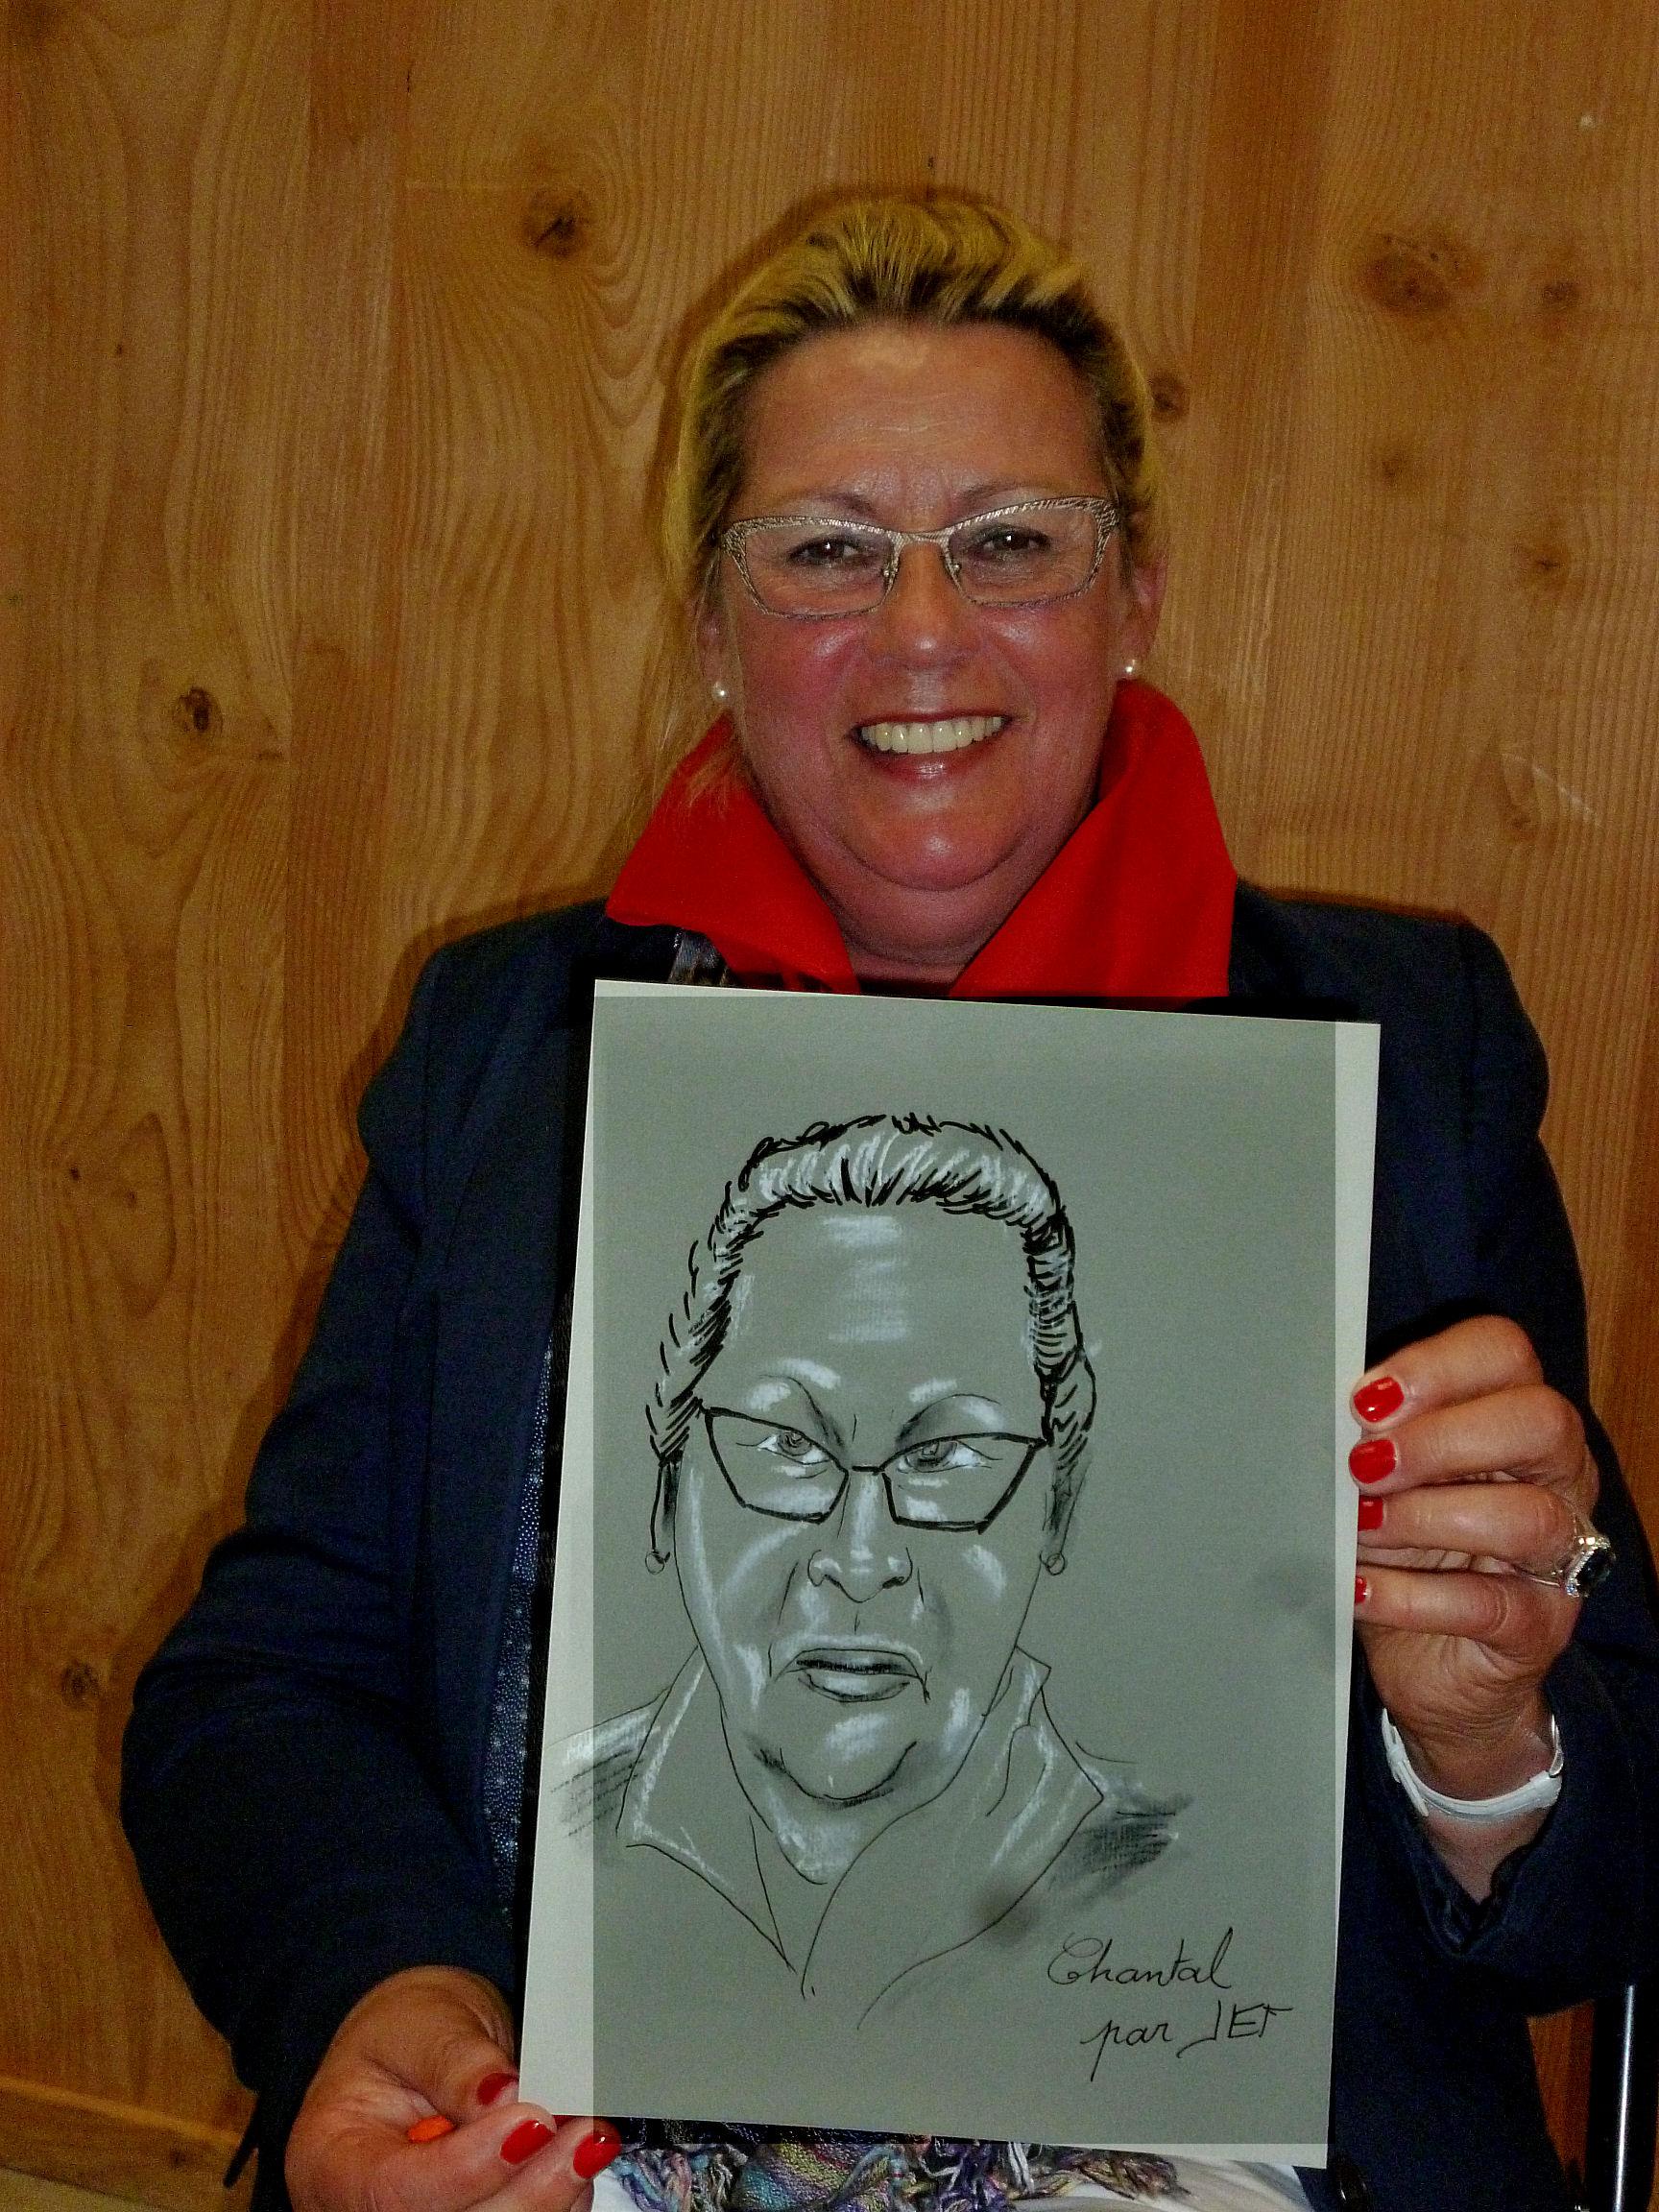 Chantal caricature de JEF